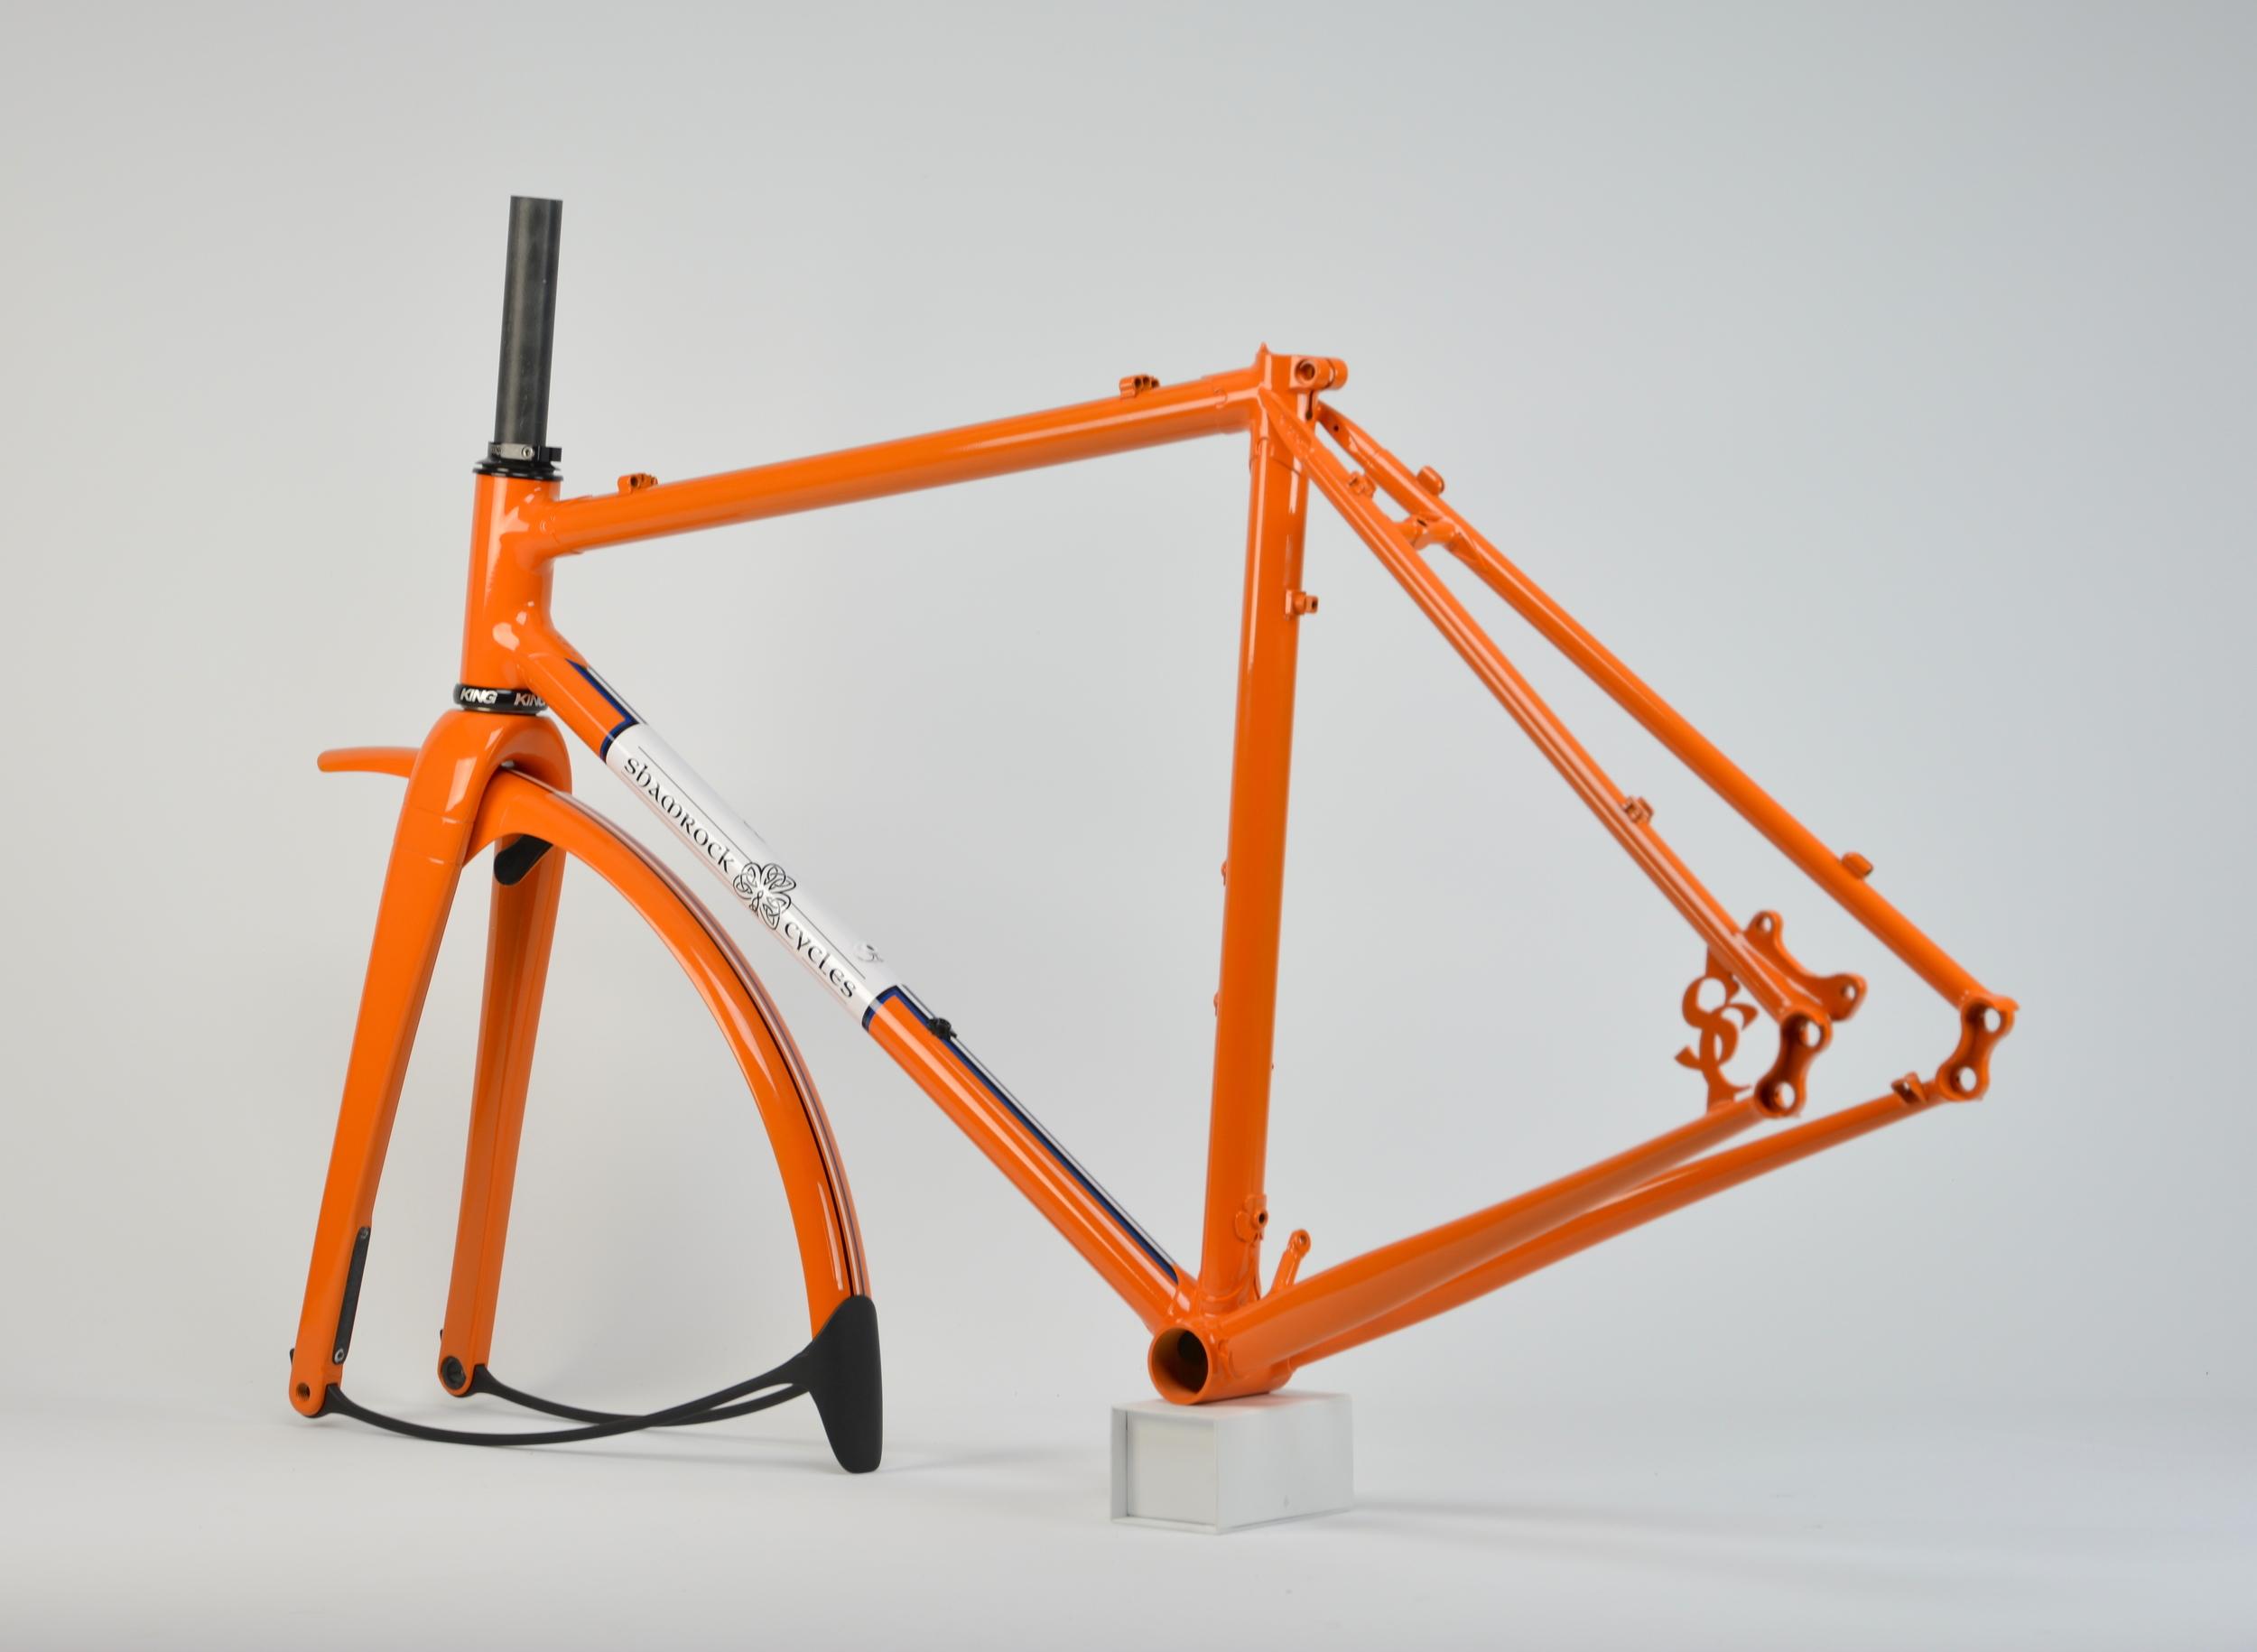 shamrock-cycles-gravel_26703608400_o.jpg